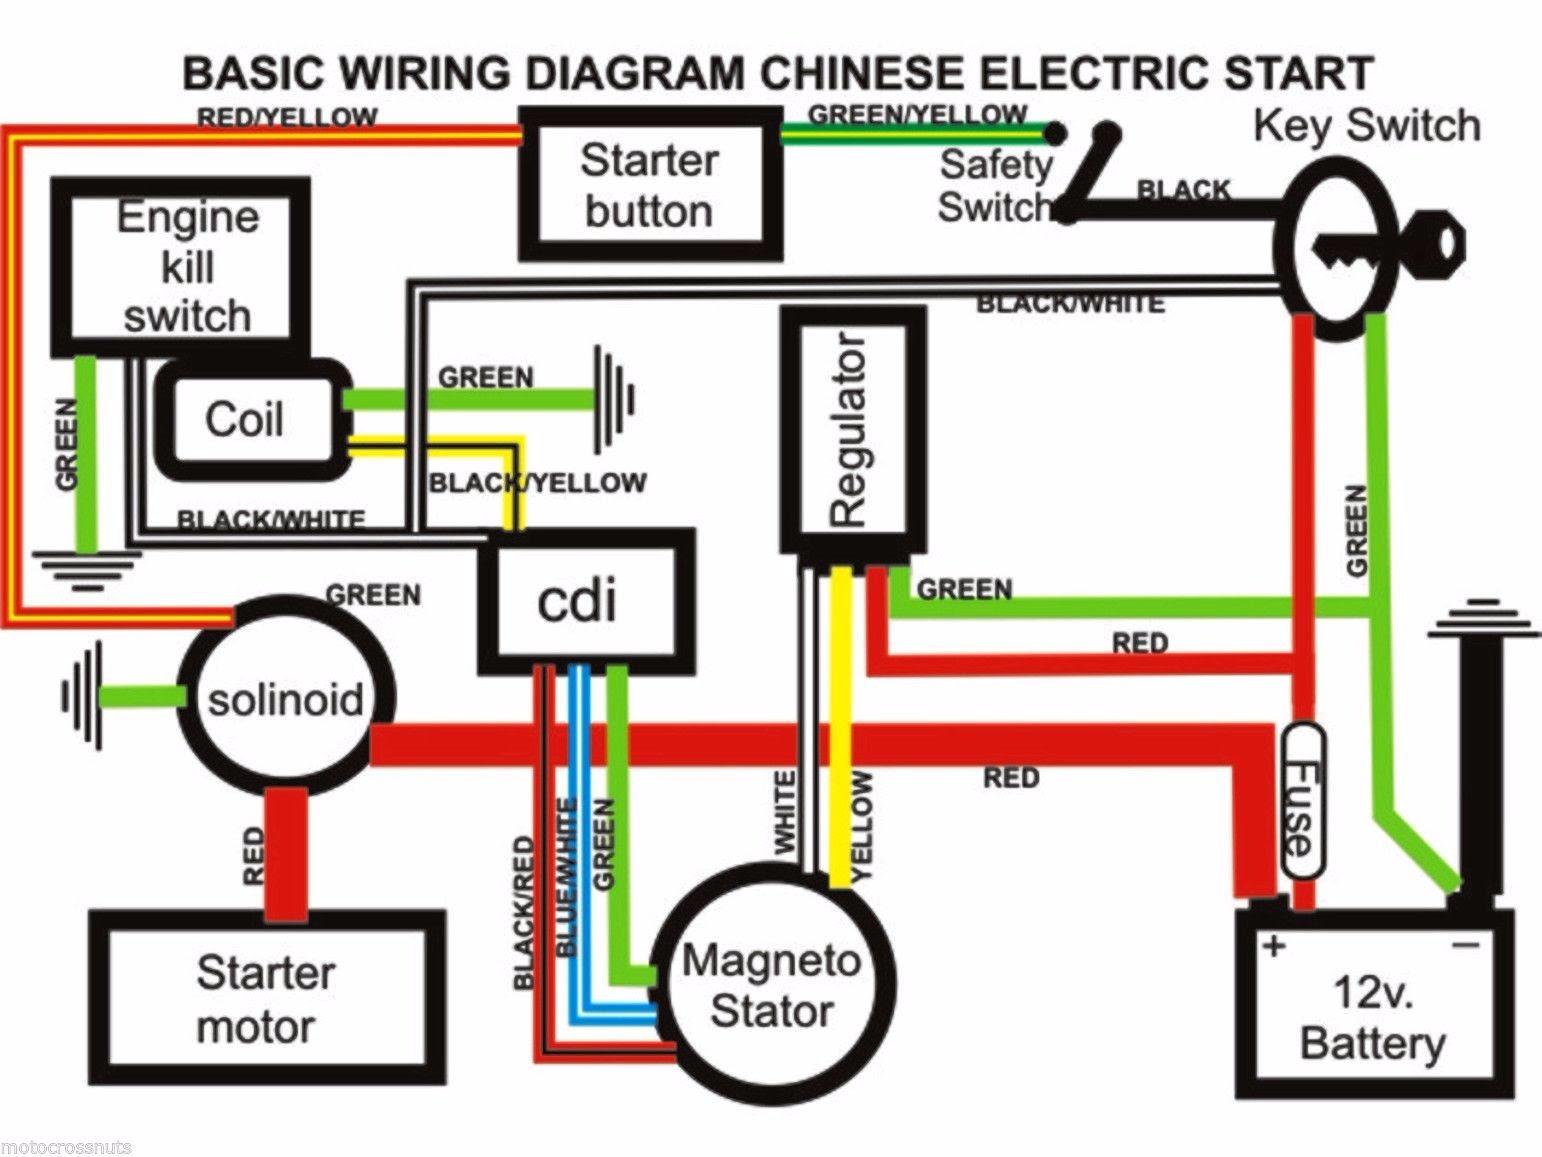 chinese motorcycle wiring diagram lifan 250cc engine wiring diagram car view specs  lifan 250cc engine wiring diagram car